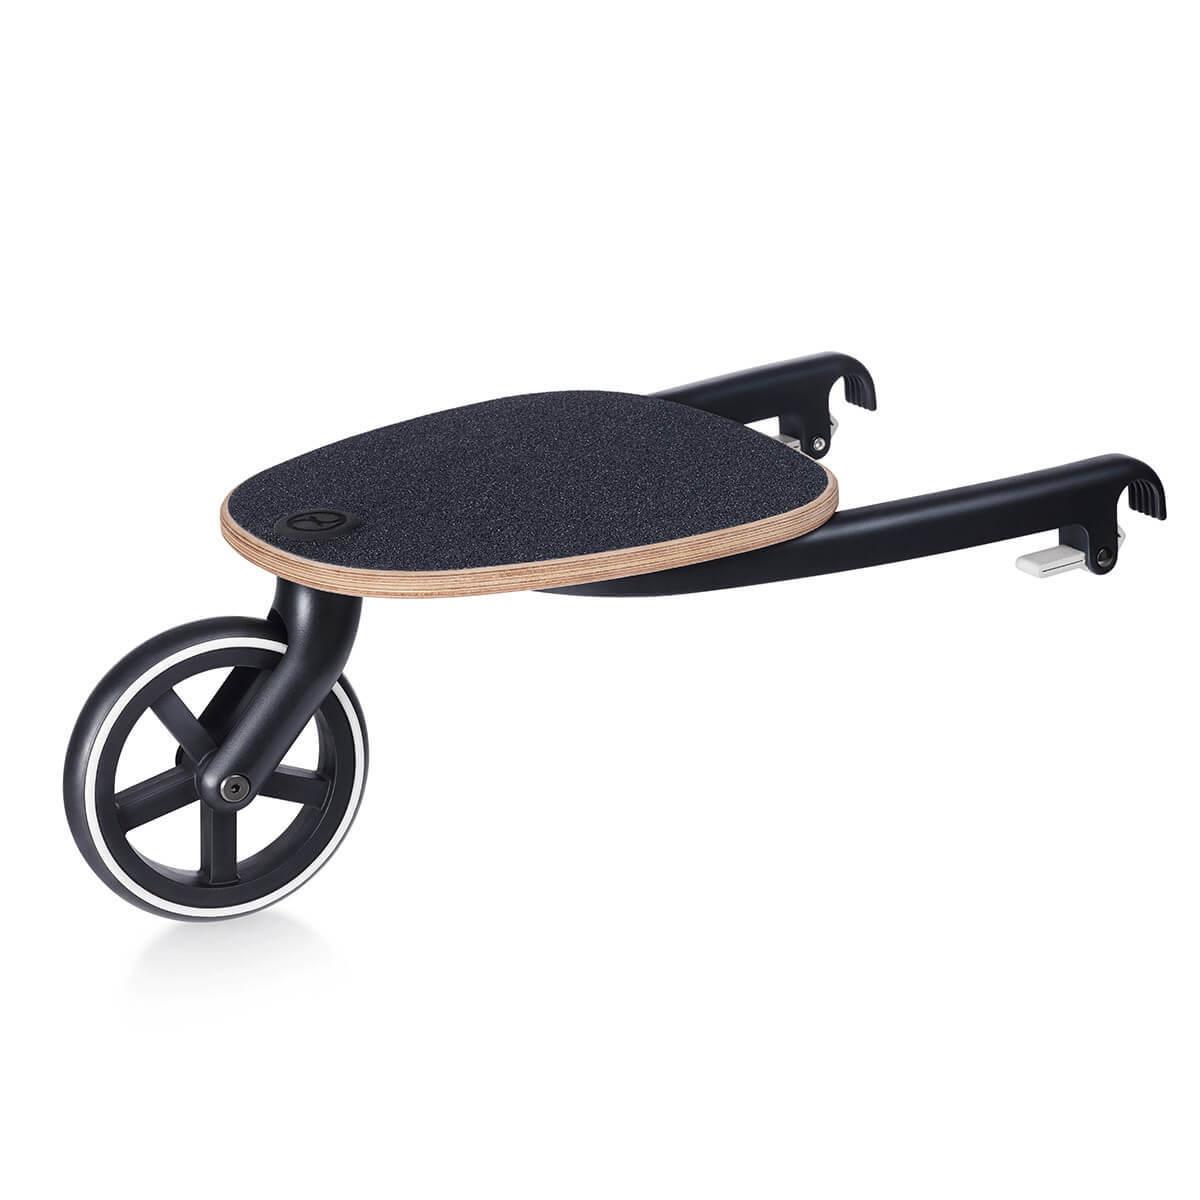 Прочее Подножка для старшего ребёнка к коляске Cybex Priam, Balios S Kid Board Priam_KidBoard.jpg